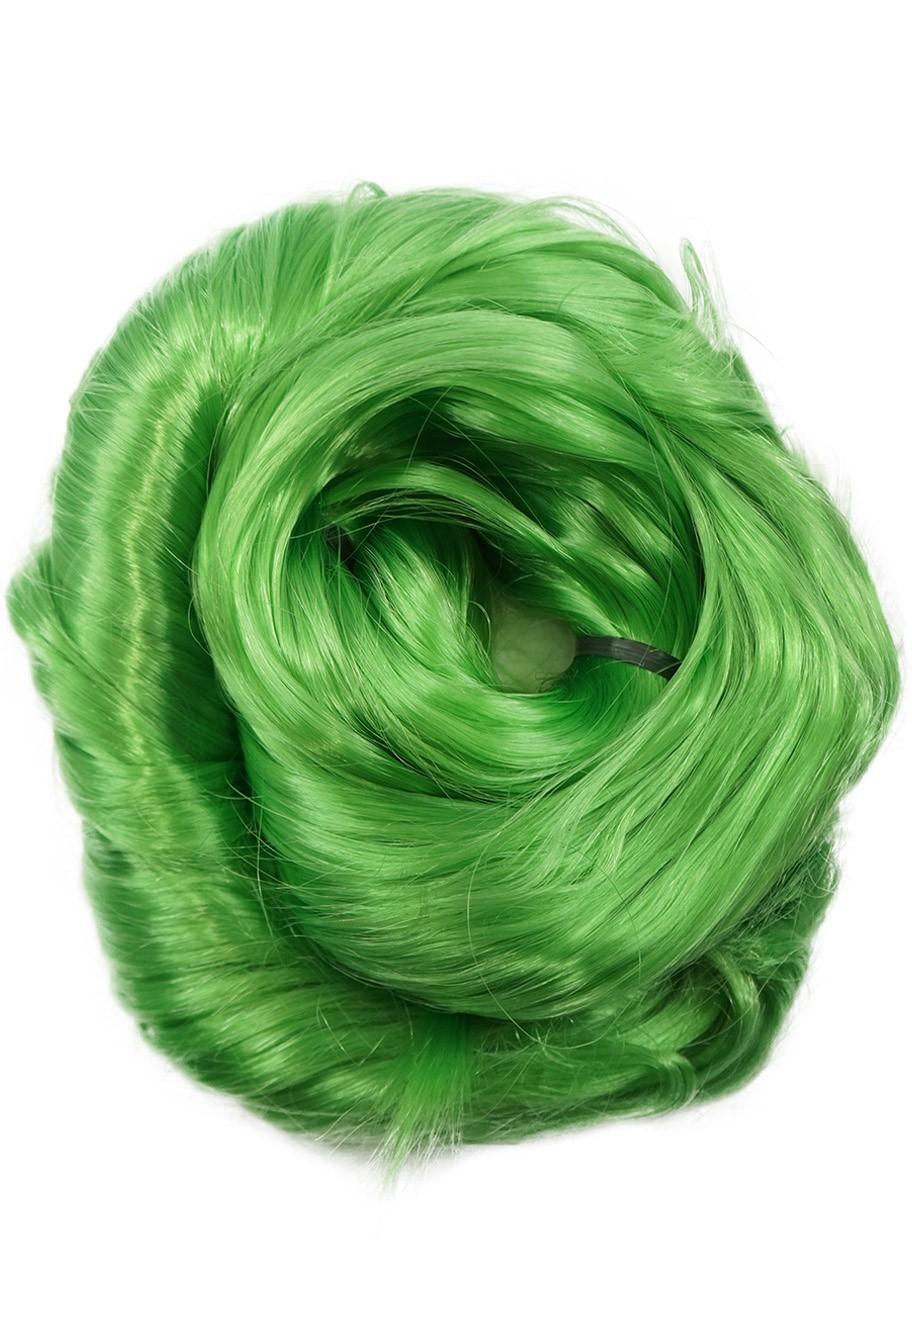 Cabelo Sintético - Fio de Fibra Nacional - Cor: Verde